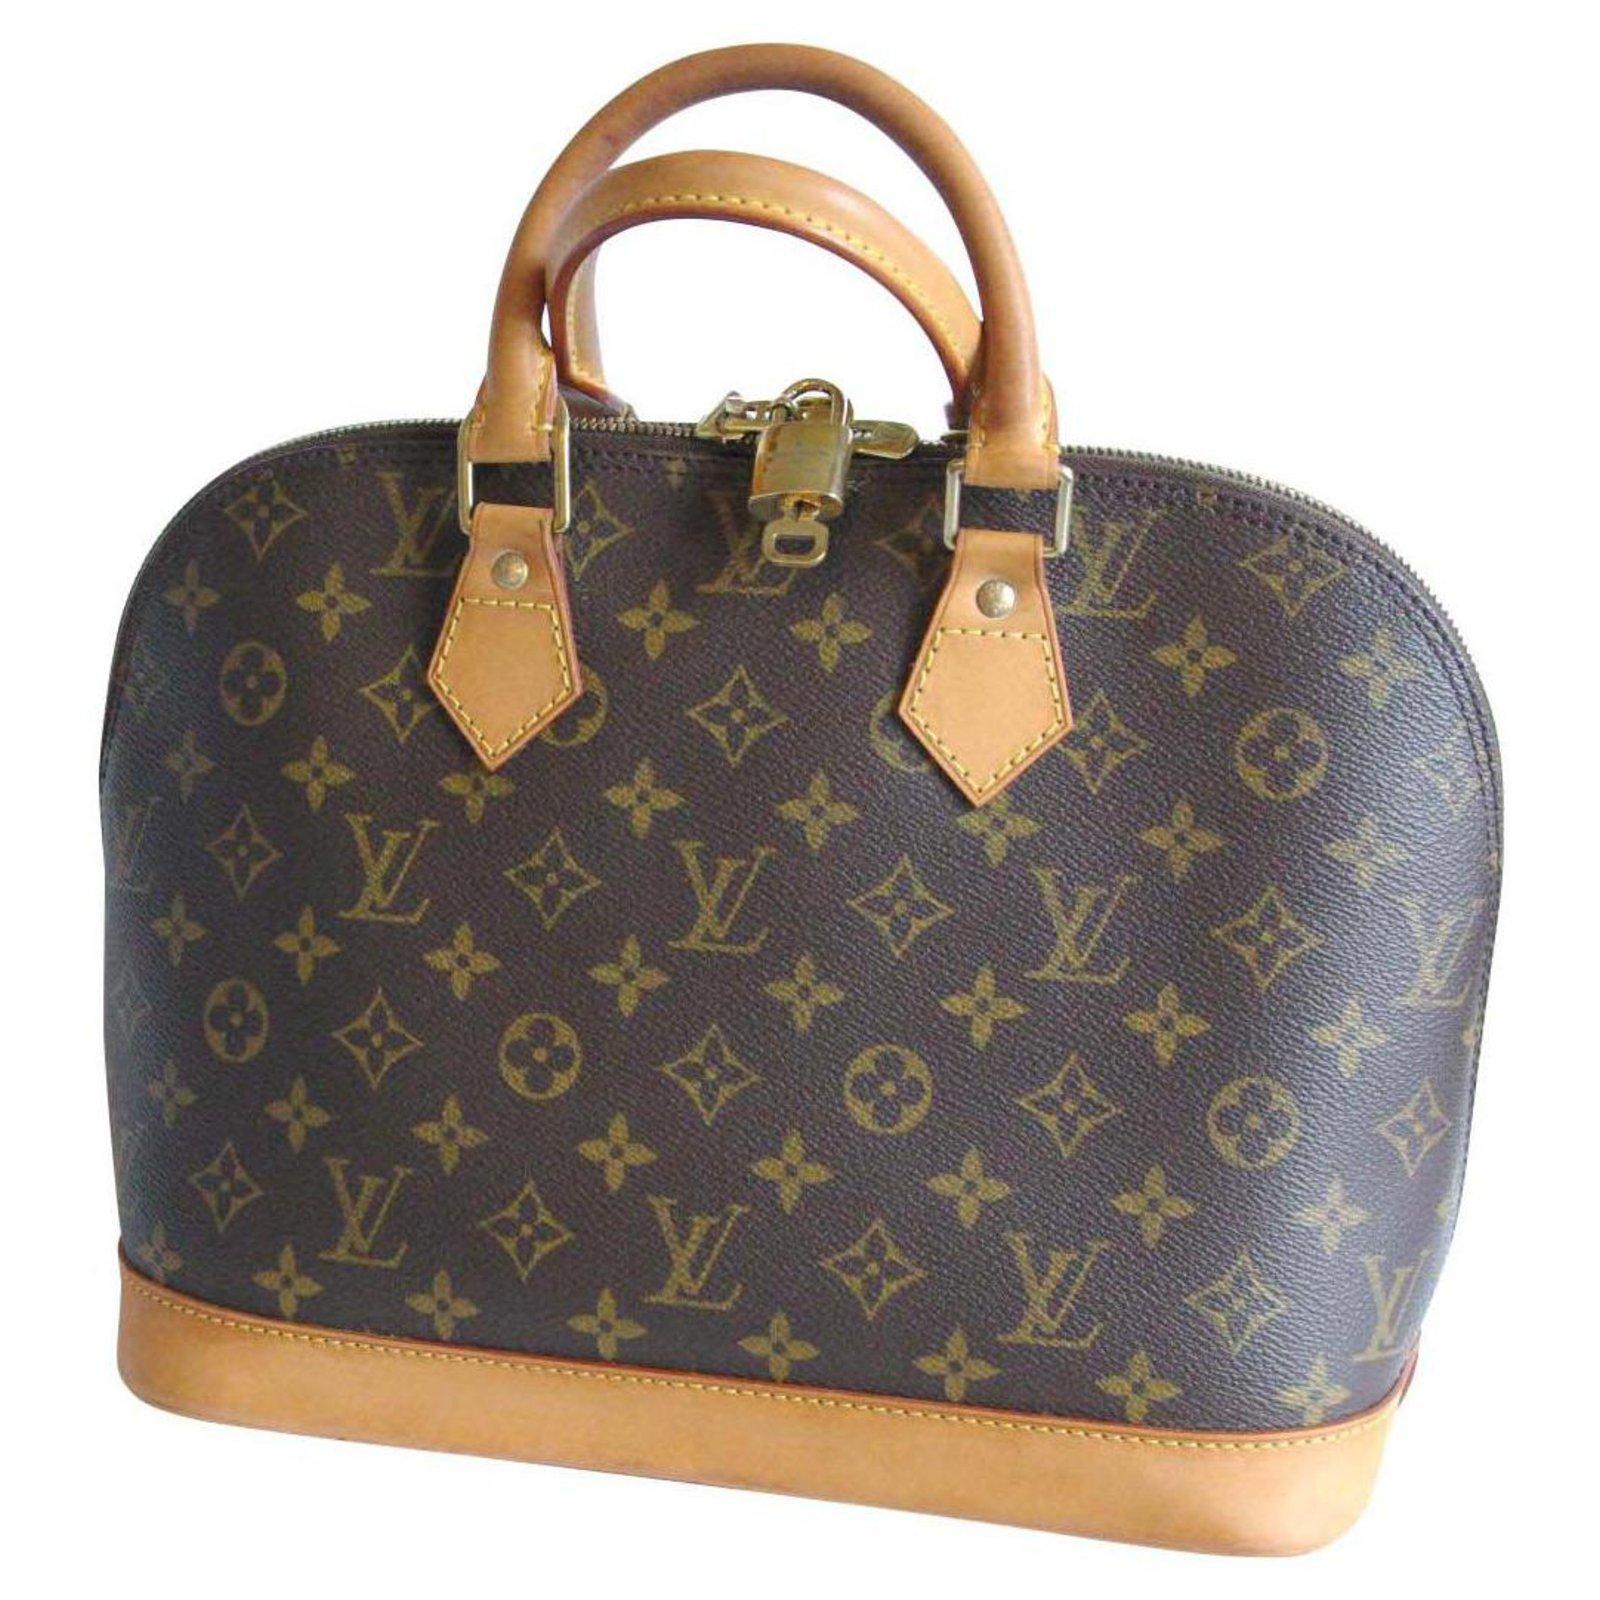 3f4265d5a3c9 Louis Vuitton ALMA MONOGRAM Handbags Leather